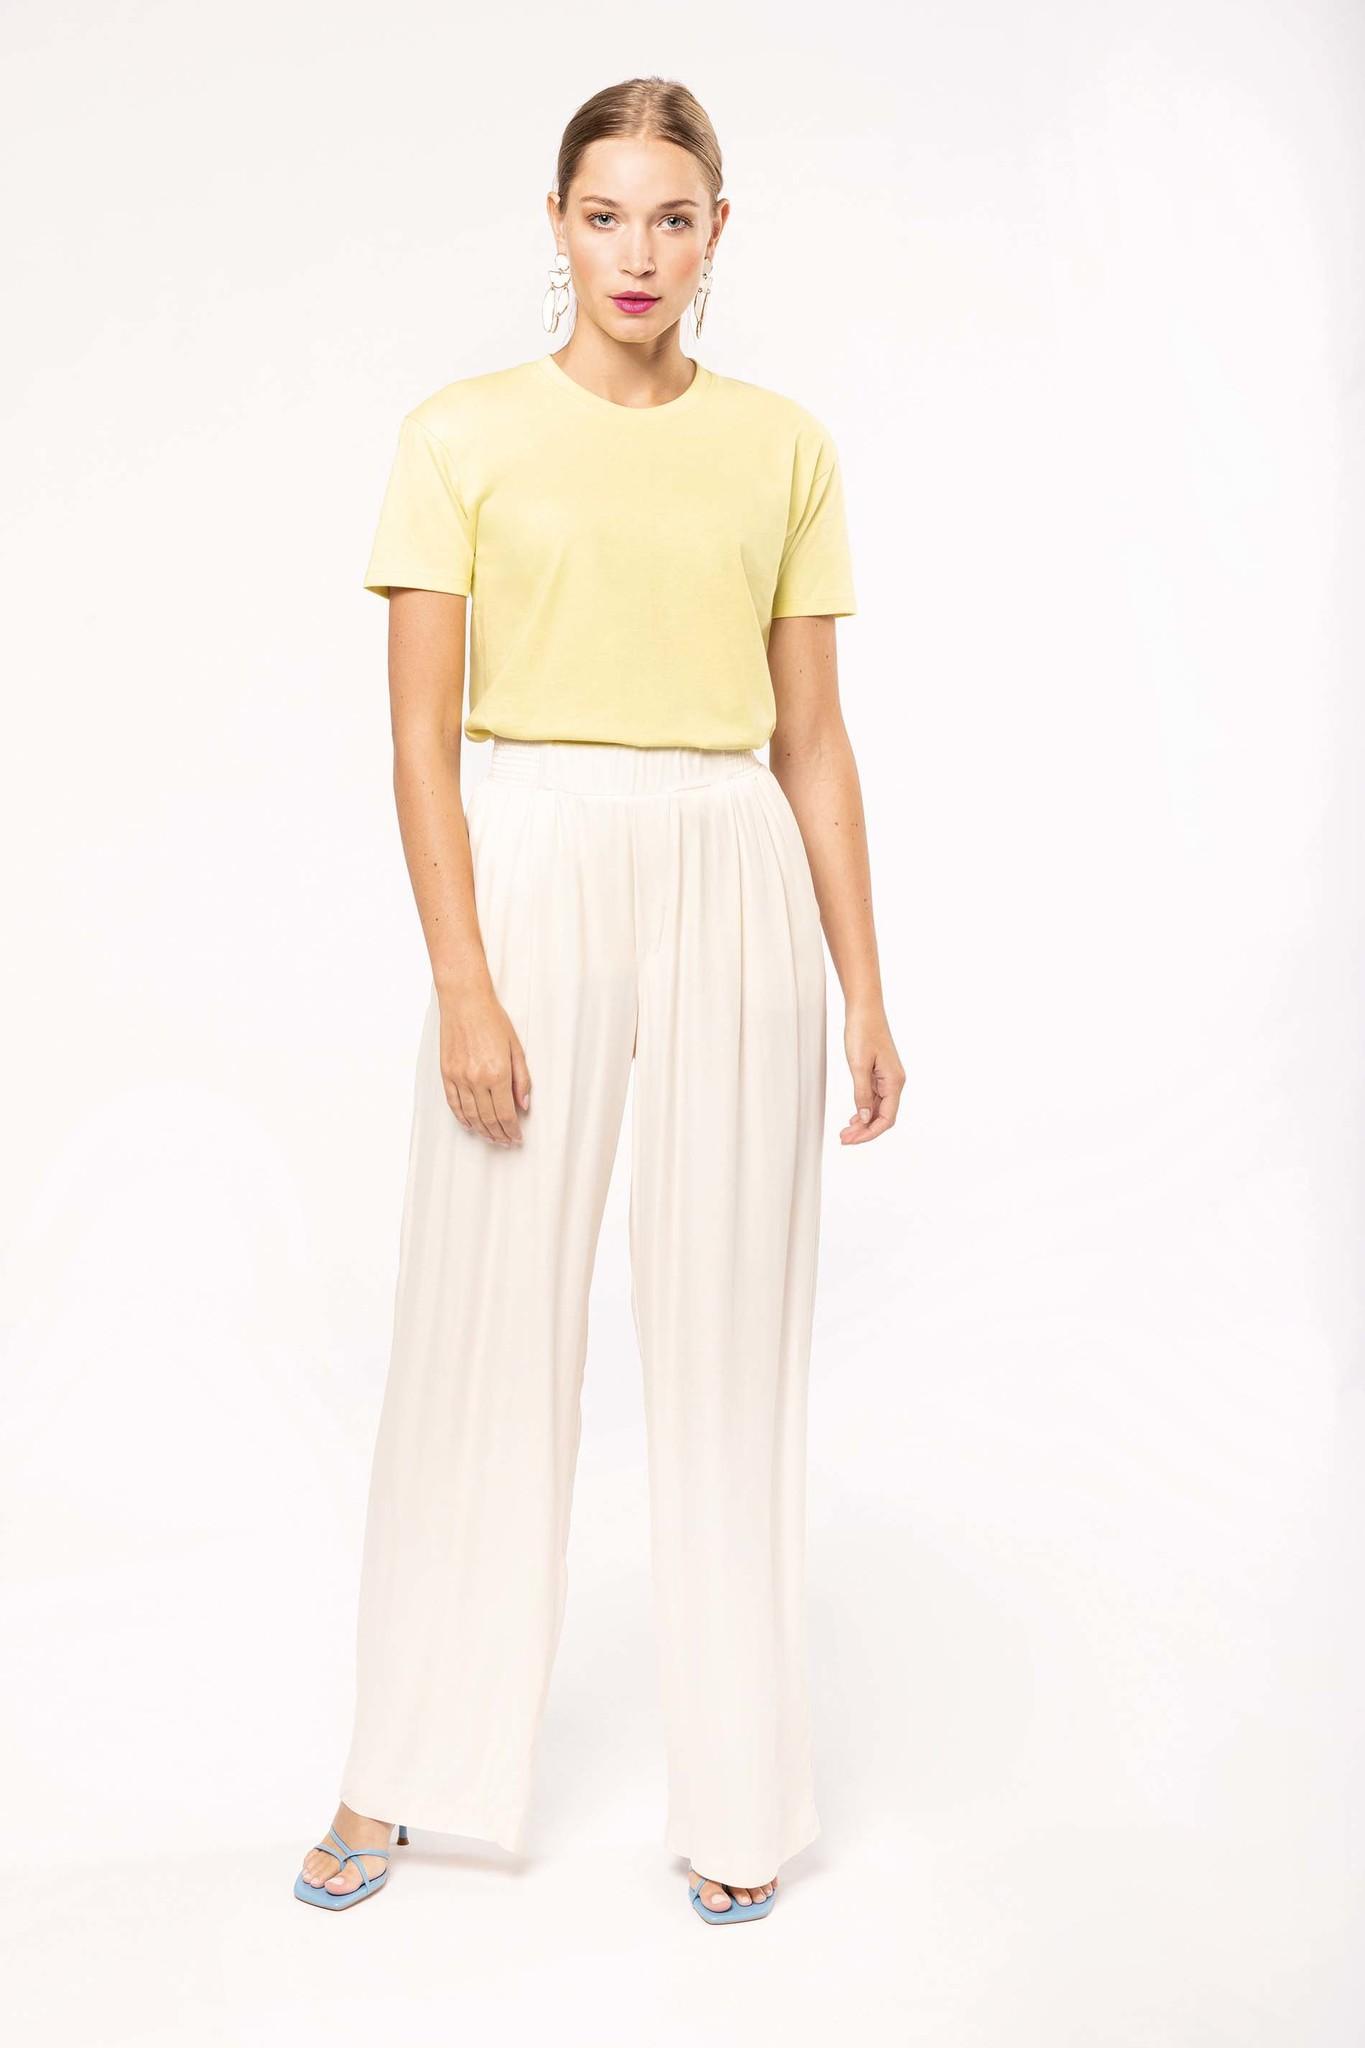 Eco-Friendly Unisex T-shirt - Lemon Yellow